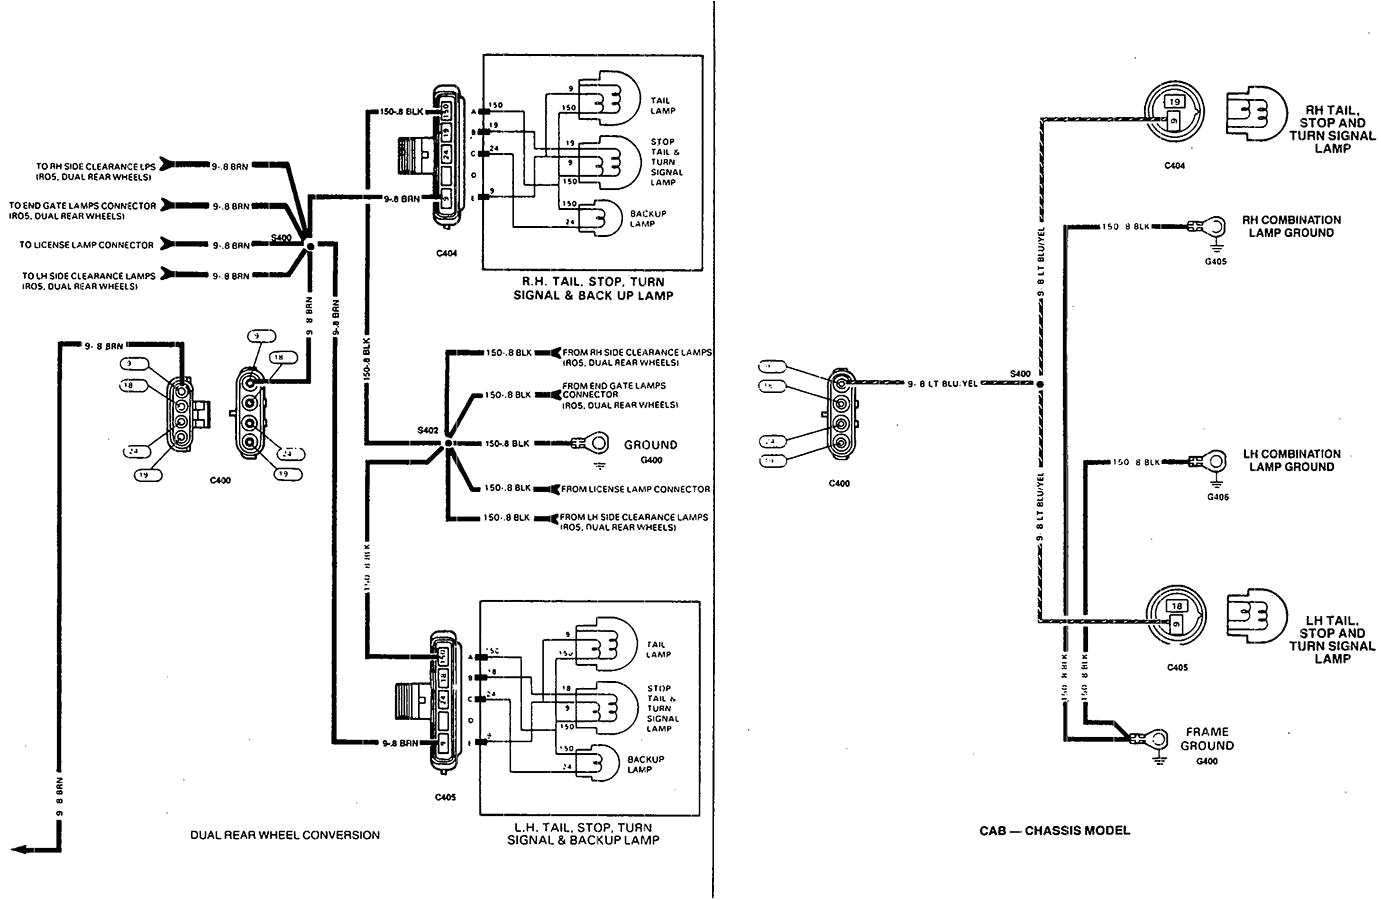 2001 toyota ta a tail lights wiring diagram wiring diagram expert 2001 toyota tacoma tail light wiring diagram 2001 toyota ta a tail lights wiring diagram